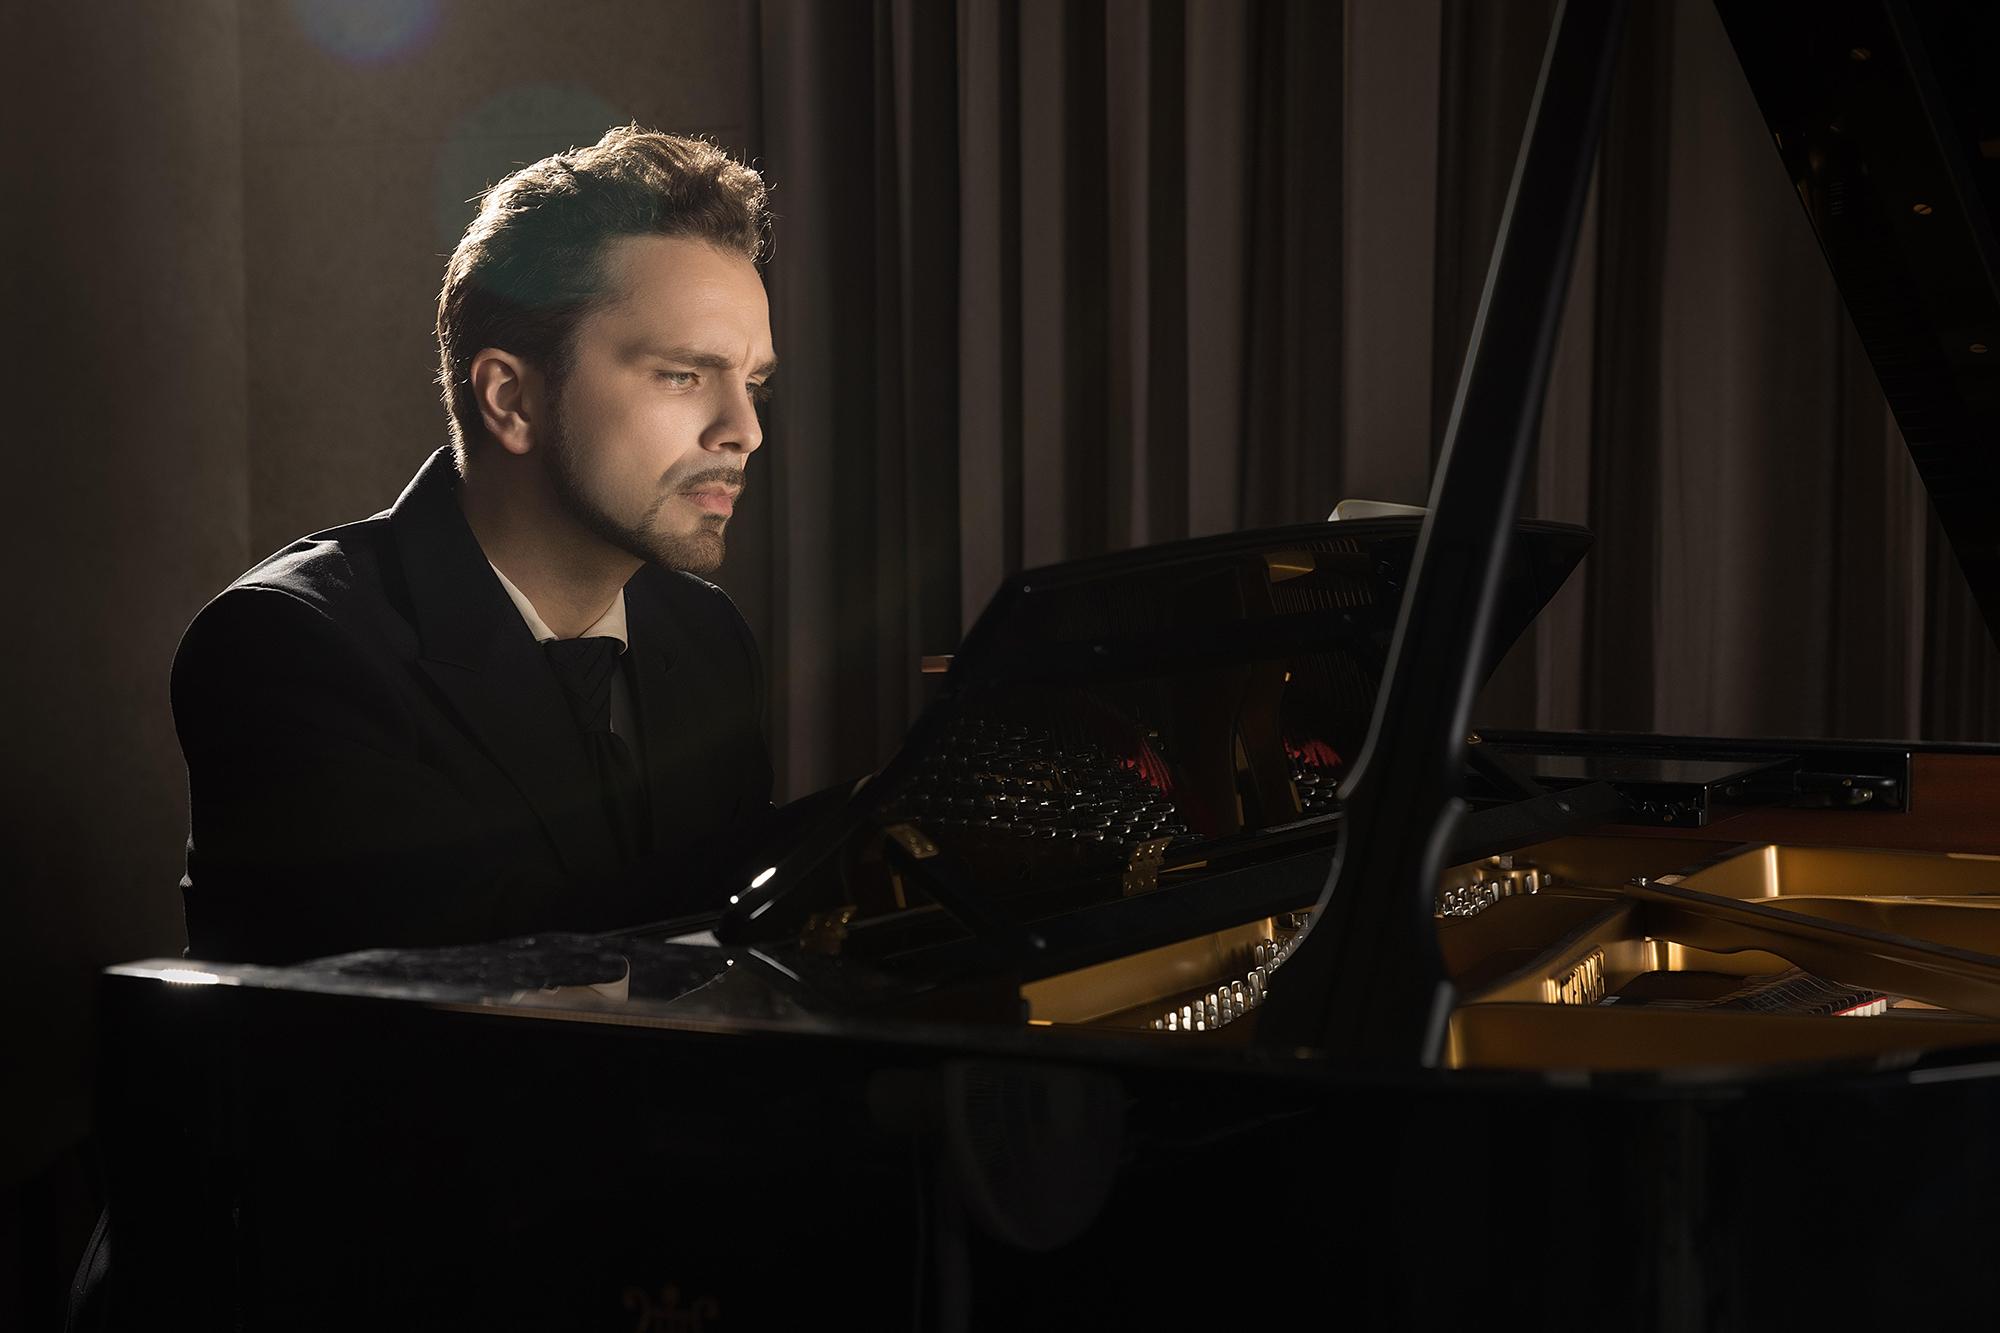 Daniel Espen composer